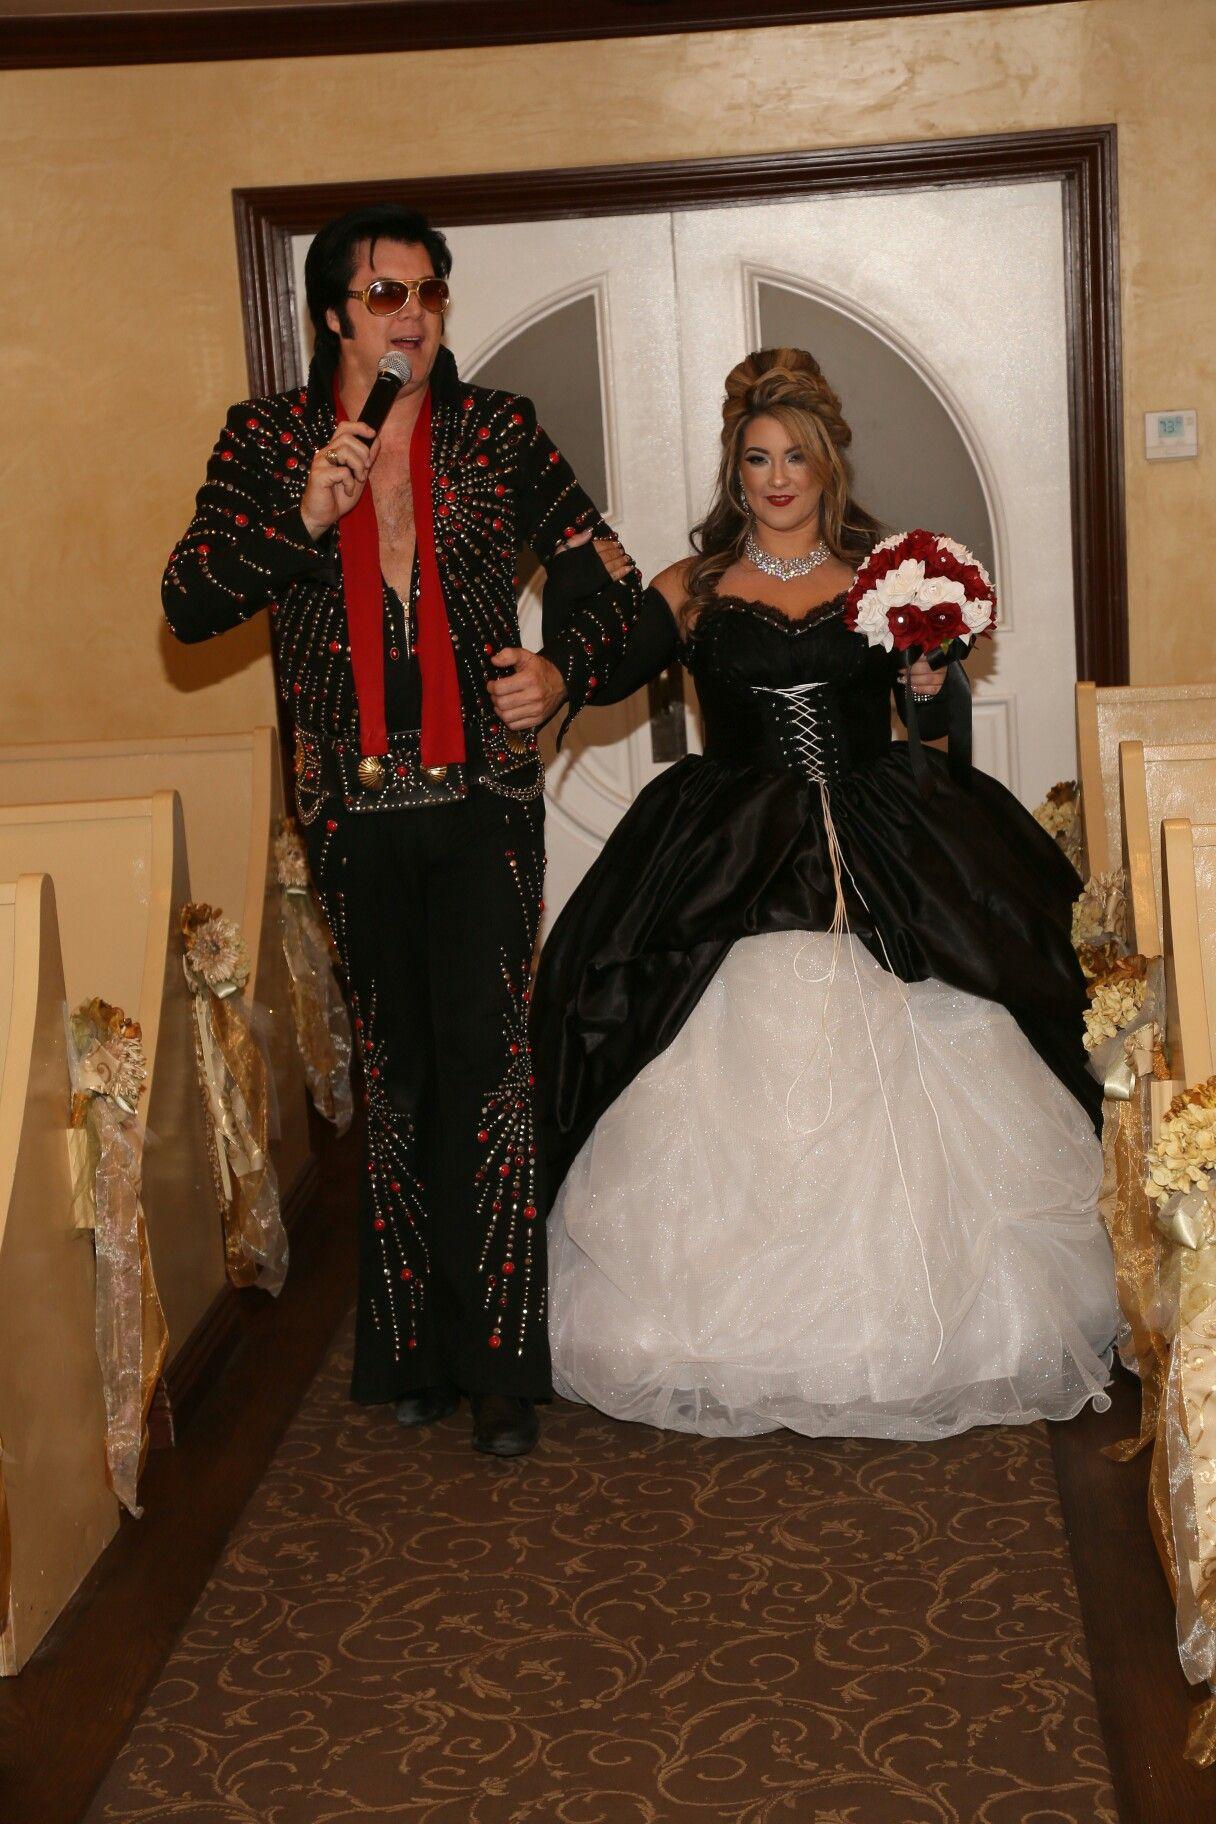 Las vegas elvis wedding black and white ball gown wedding